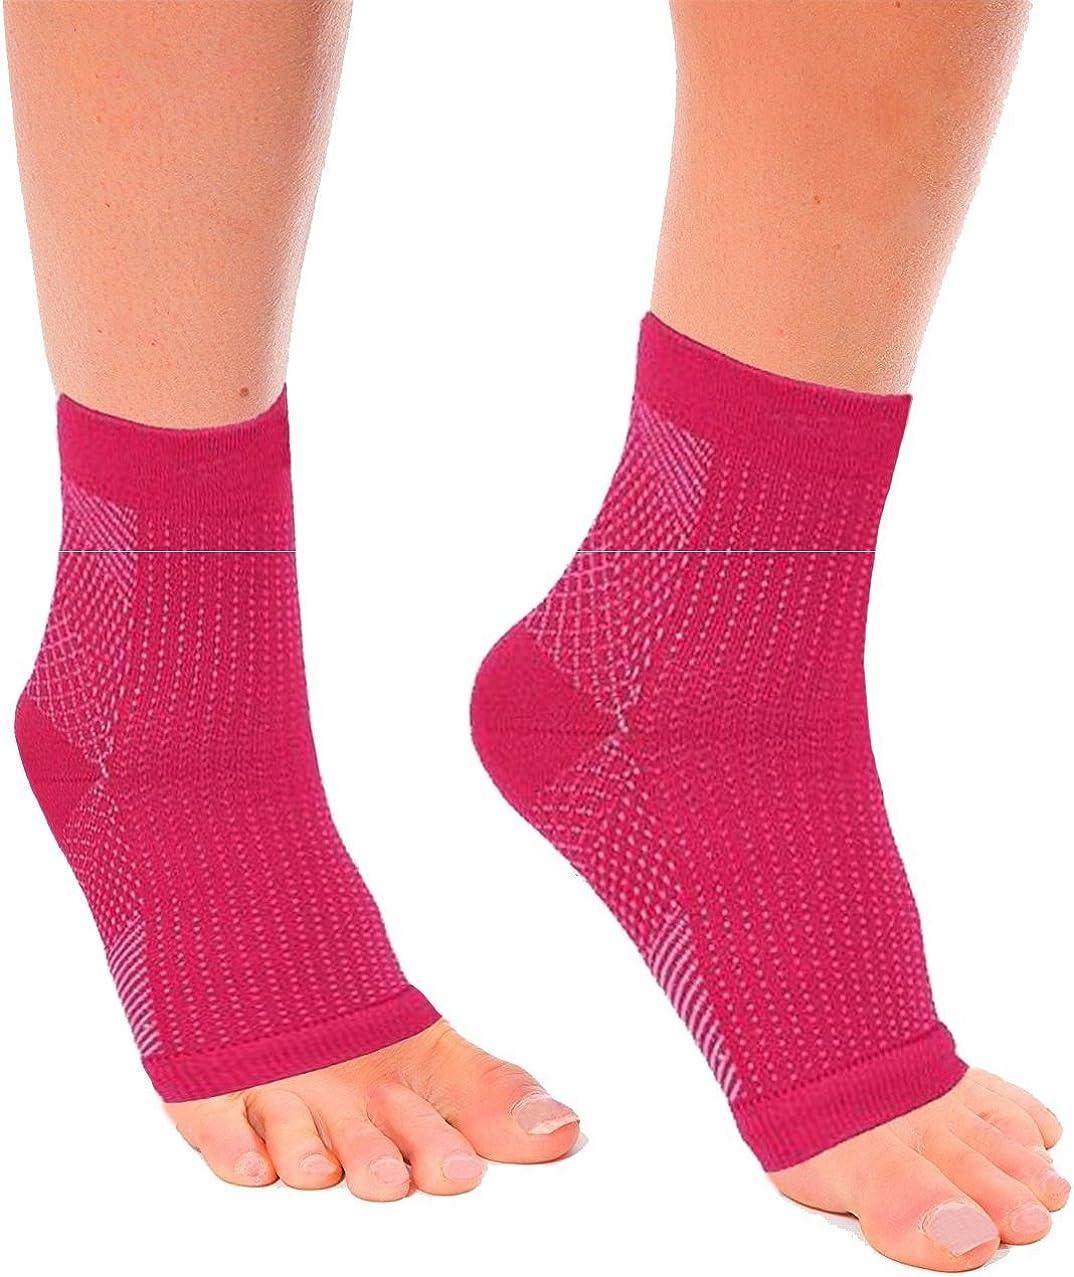 BcurbSox Ankle Sleeve Plantar Fasciitis for Foot Heel Men Genuine Free Shipping Women Atlanta Mall